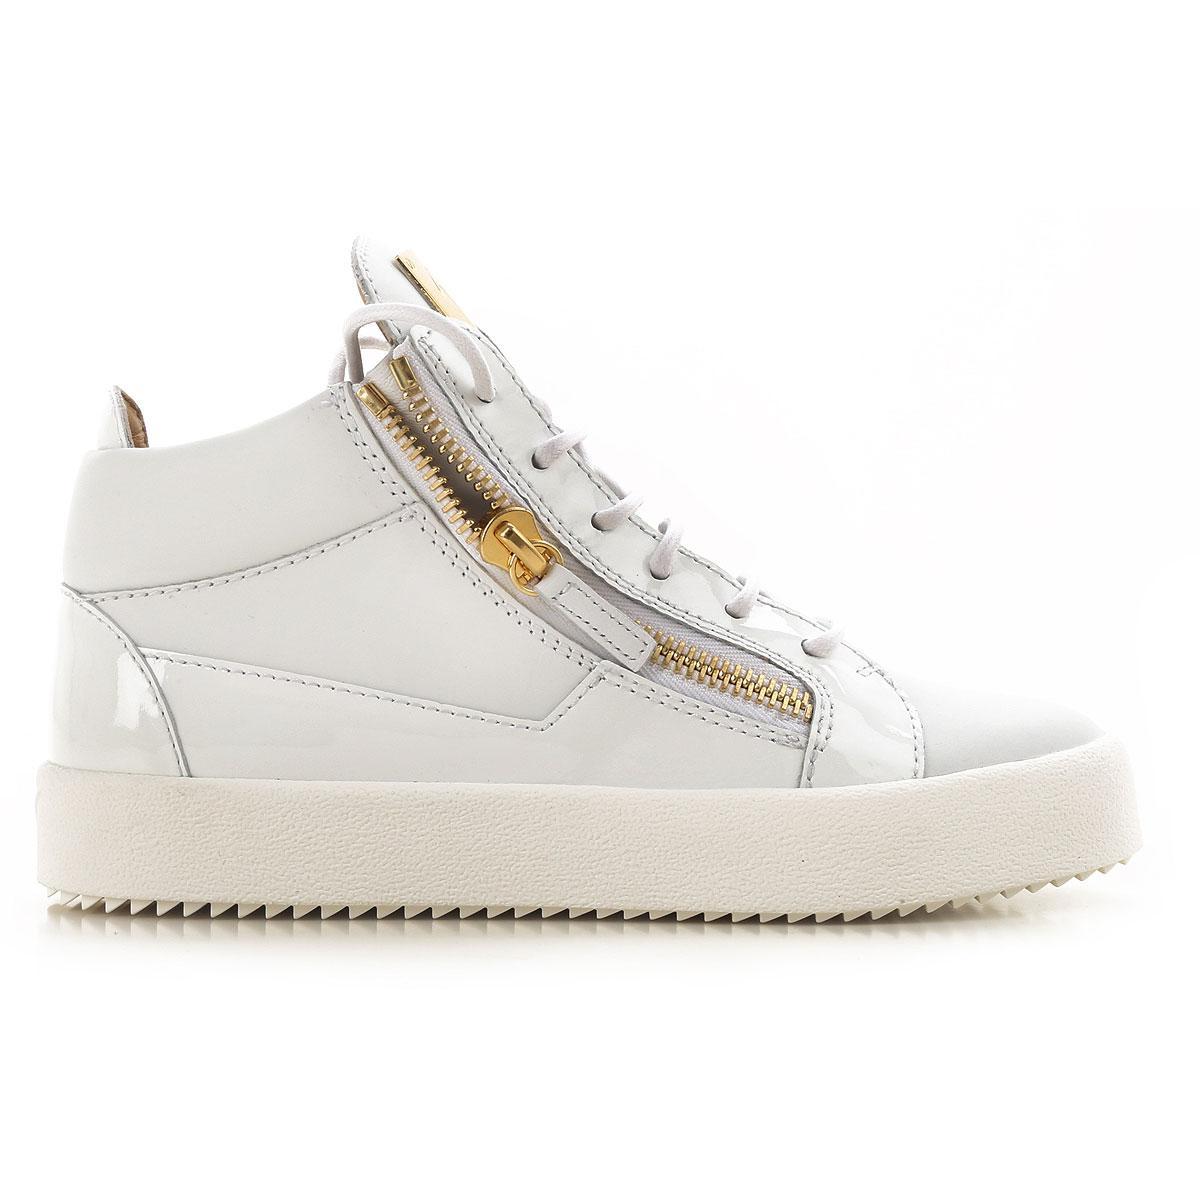 Giuseppe Zanotti - White Sneaker Femme Pas cher en Soldes - Lyst. Afficher  en plein écran 821b176953ac